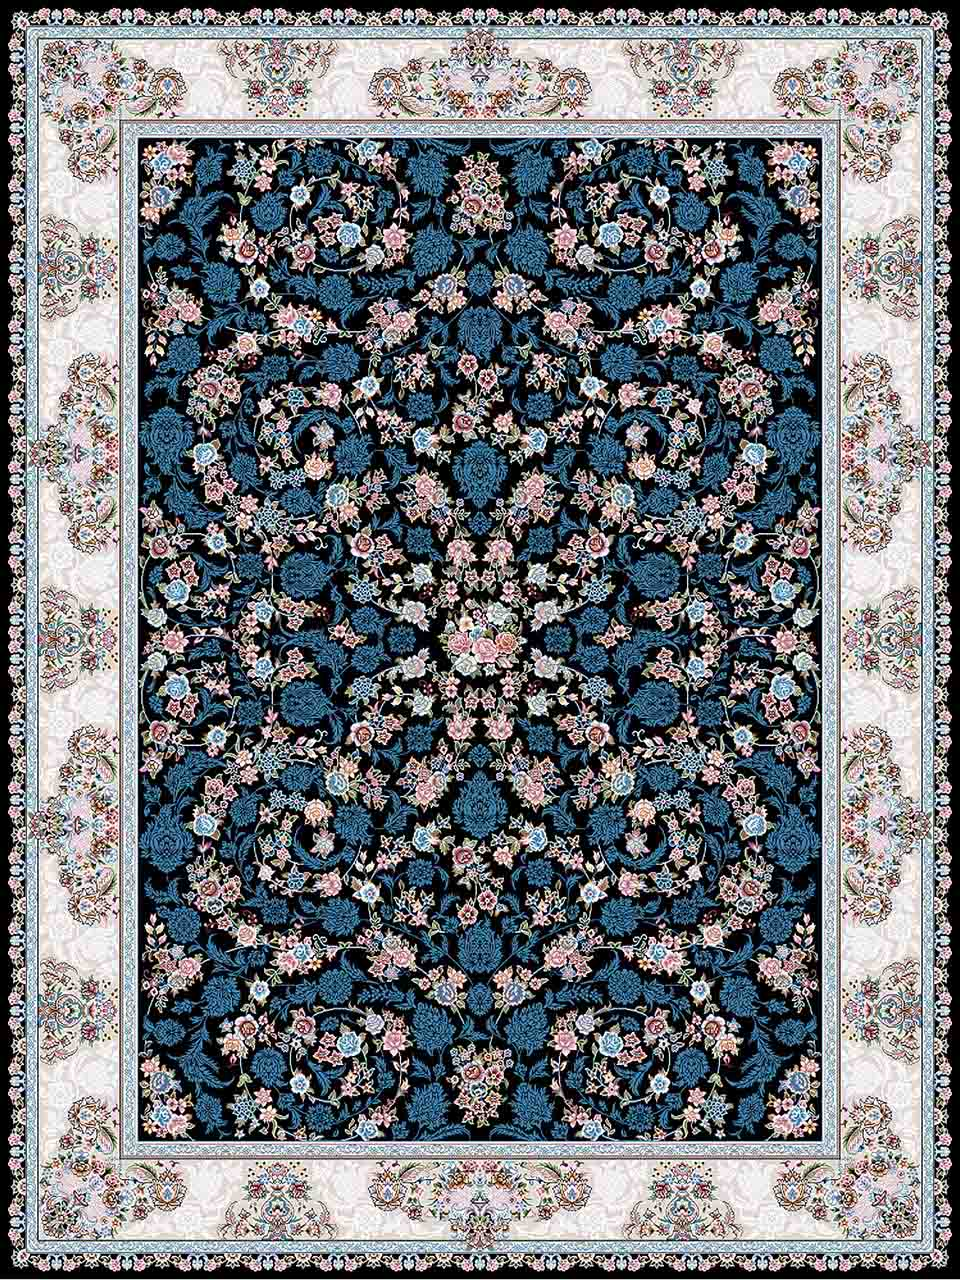 فرش (18301) اکریلیک - 8 رنگ - 500 شانه - سورمه ای- تراکم 1200